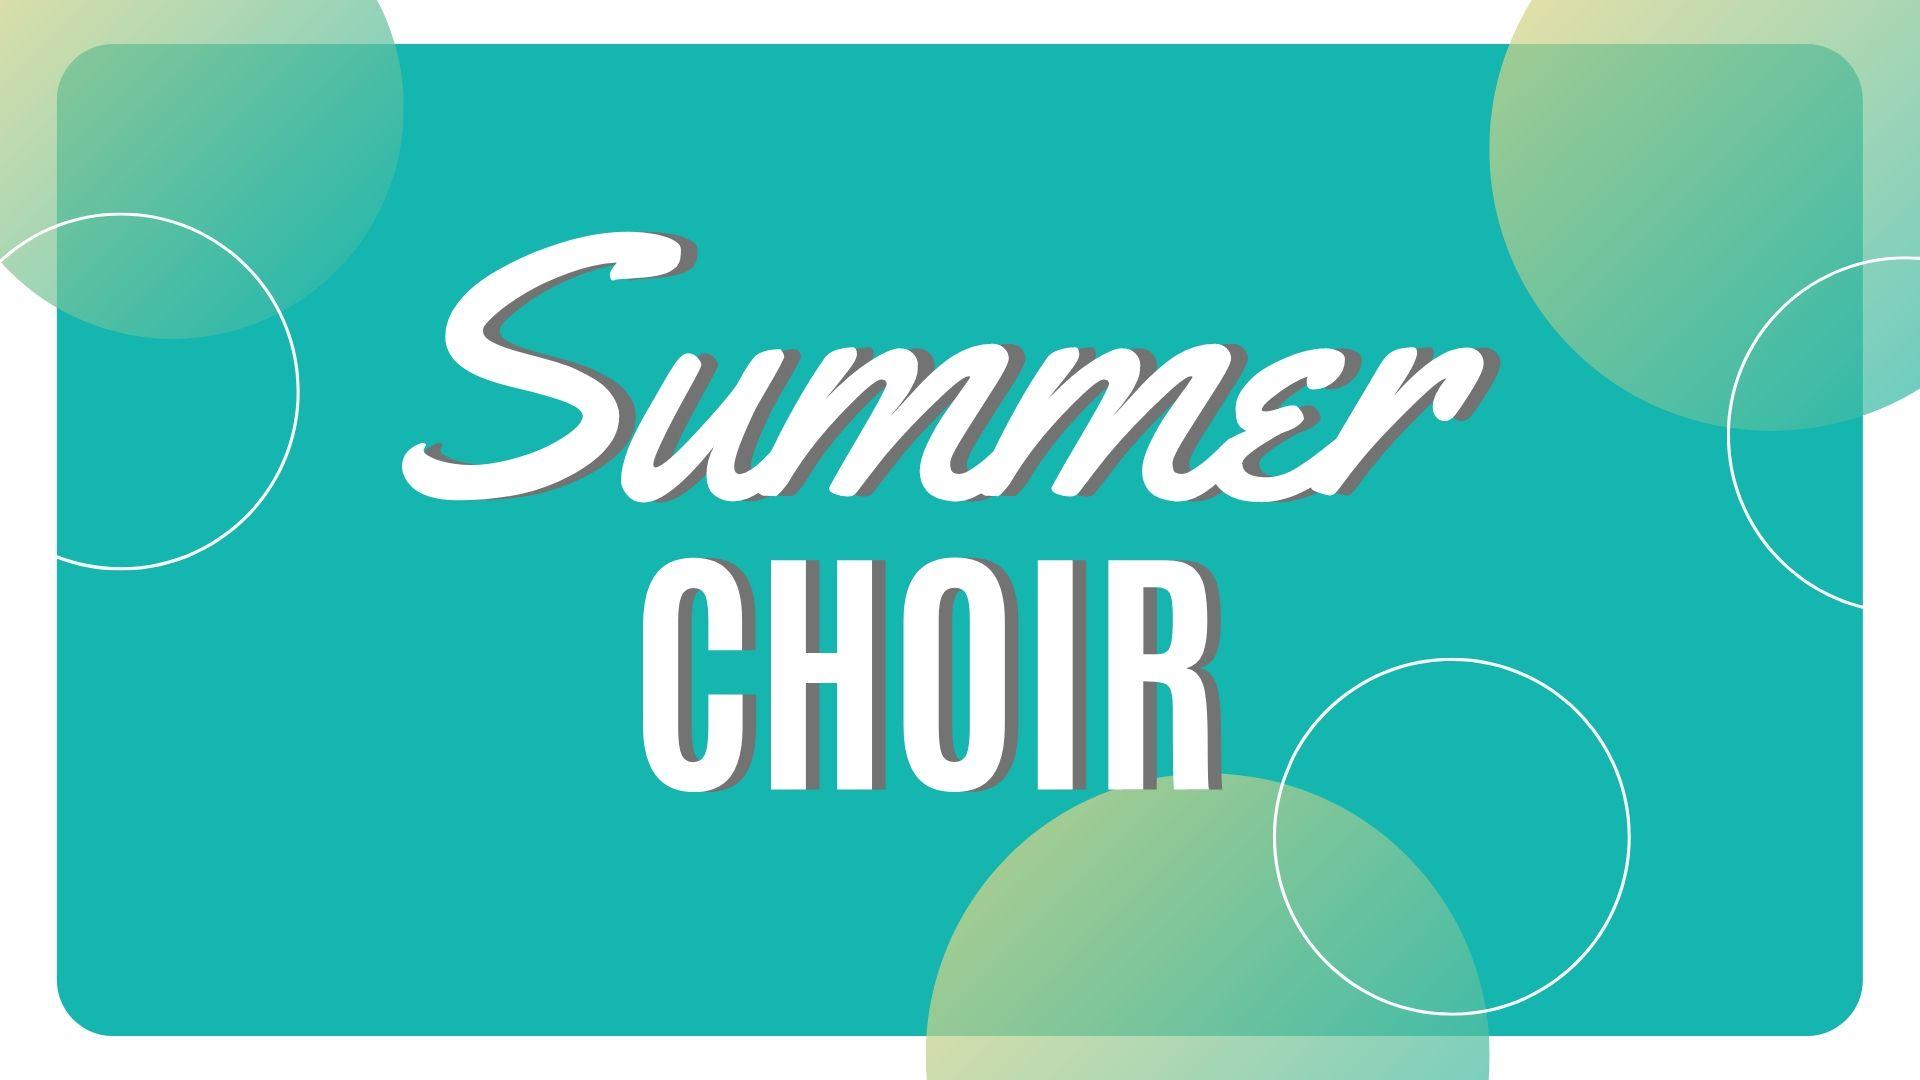 Choir (1).jpg